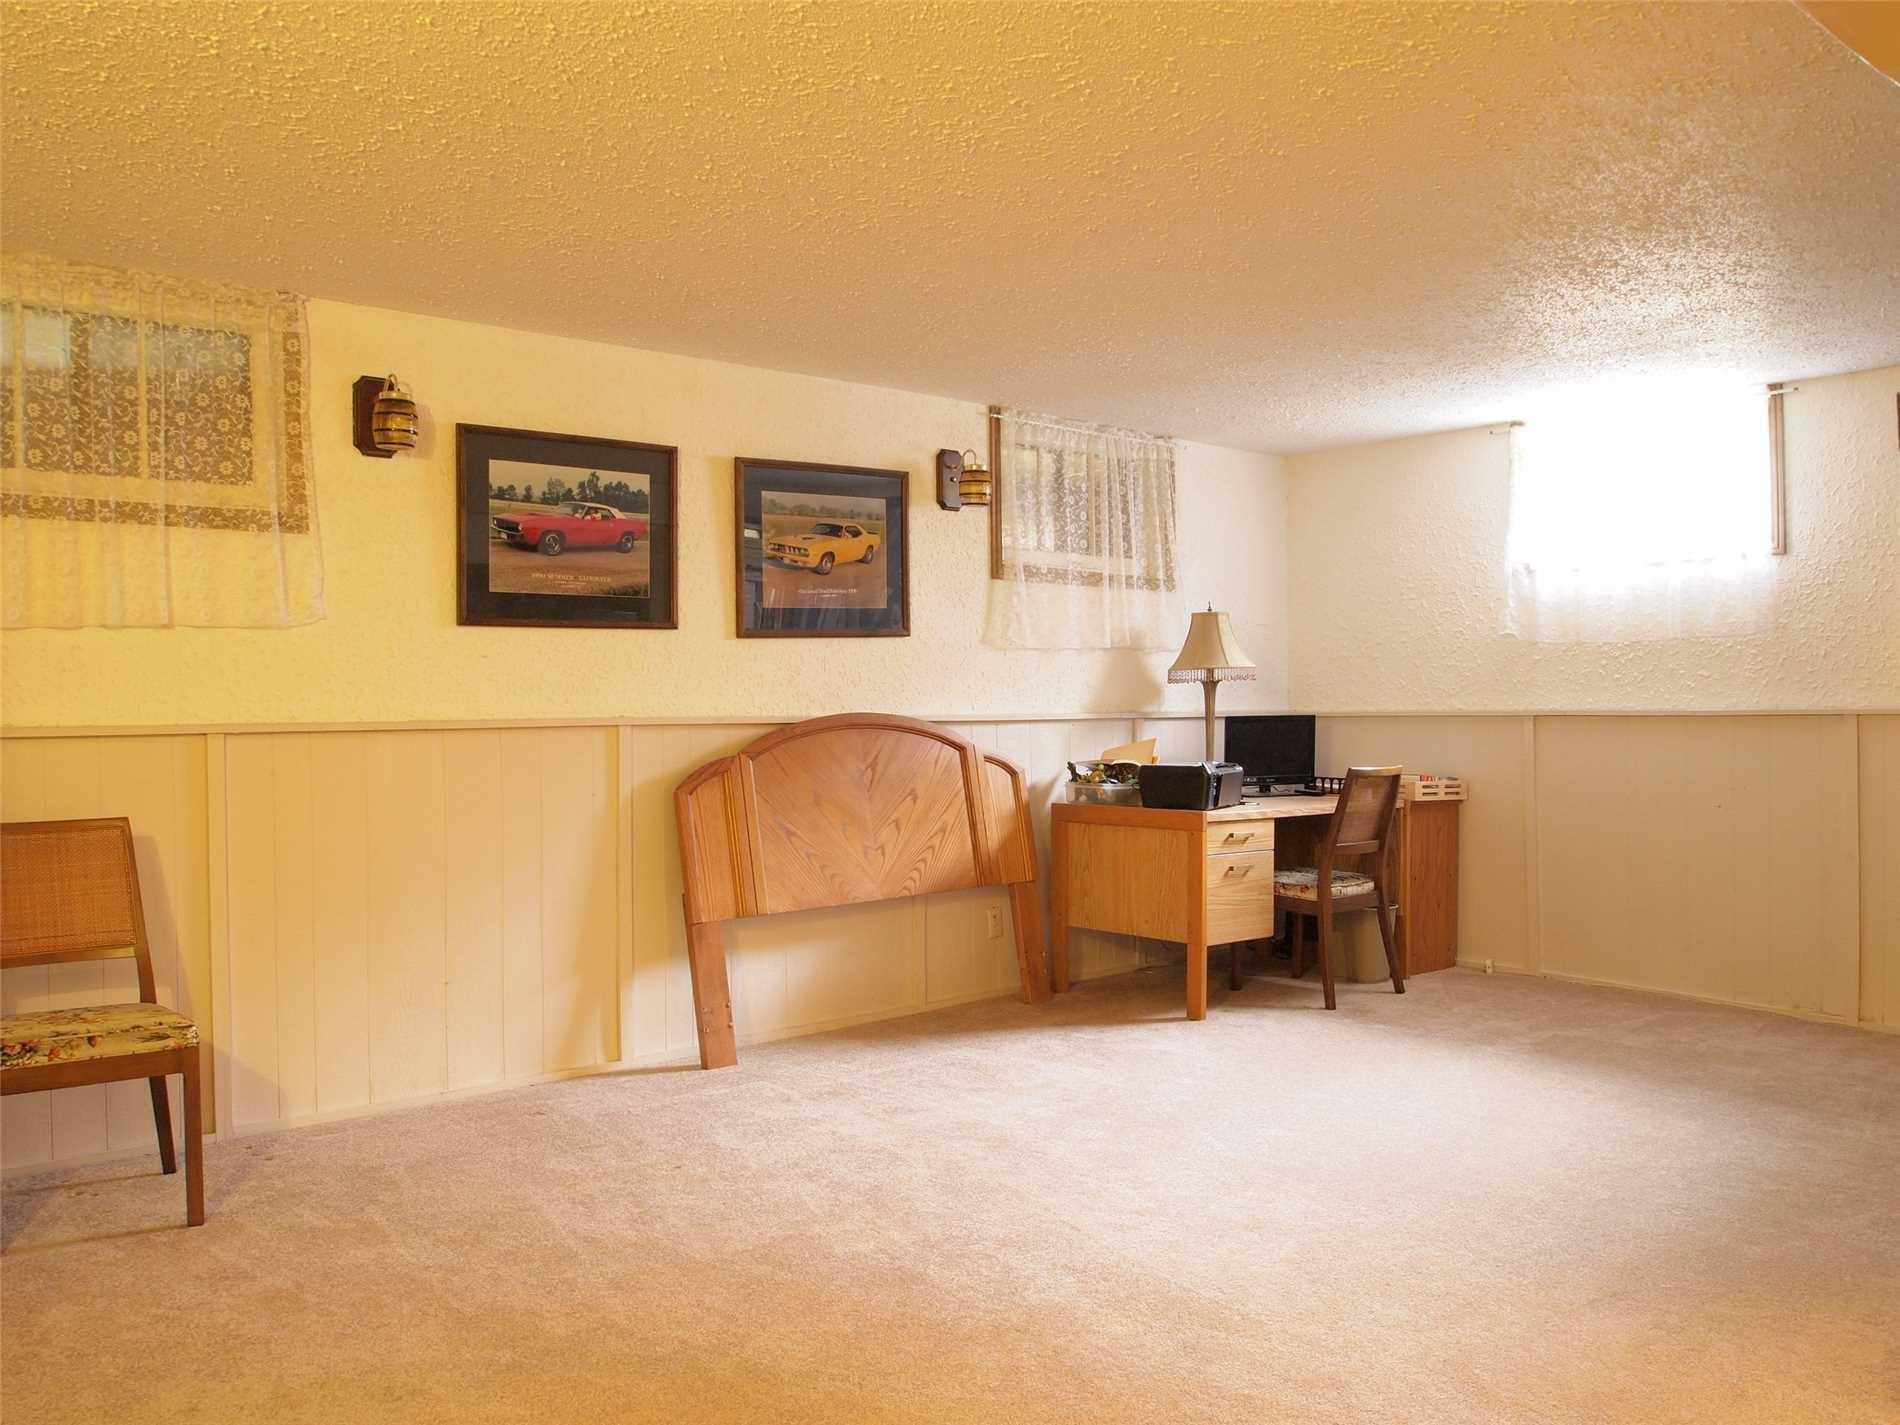 Photo 17: Photos: 105 Fifth Street in Brock: Beaverton House (Bungalow) for sale : MLS®# N4564596